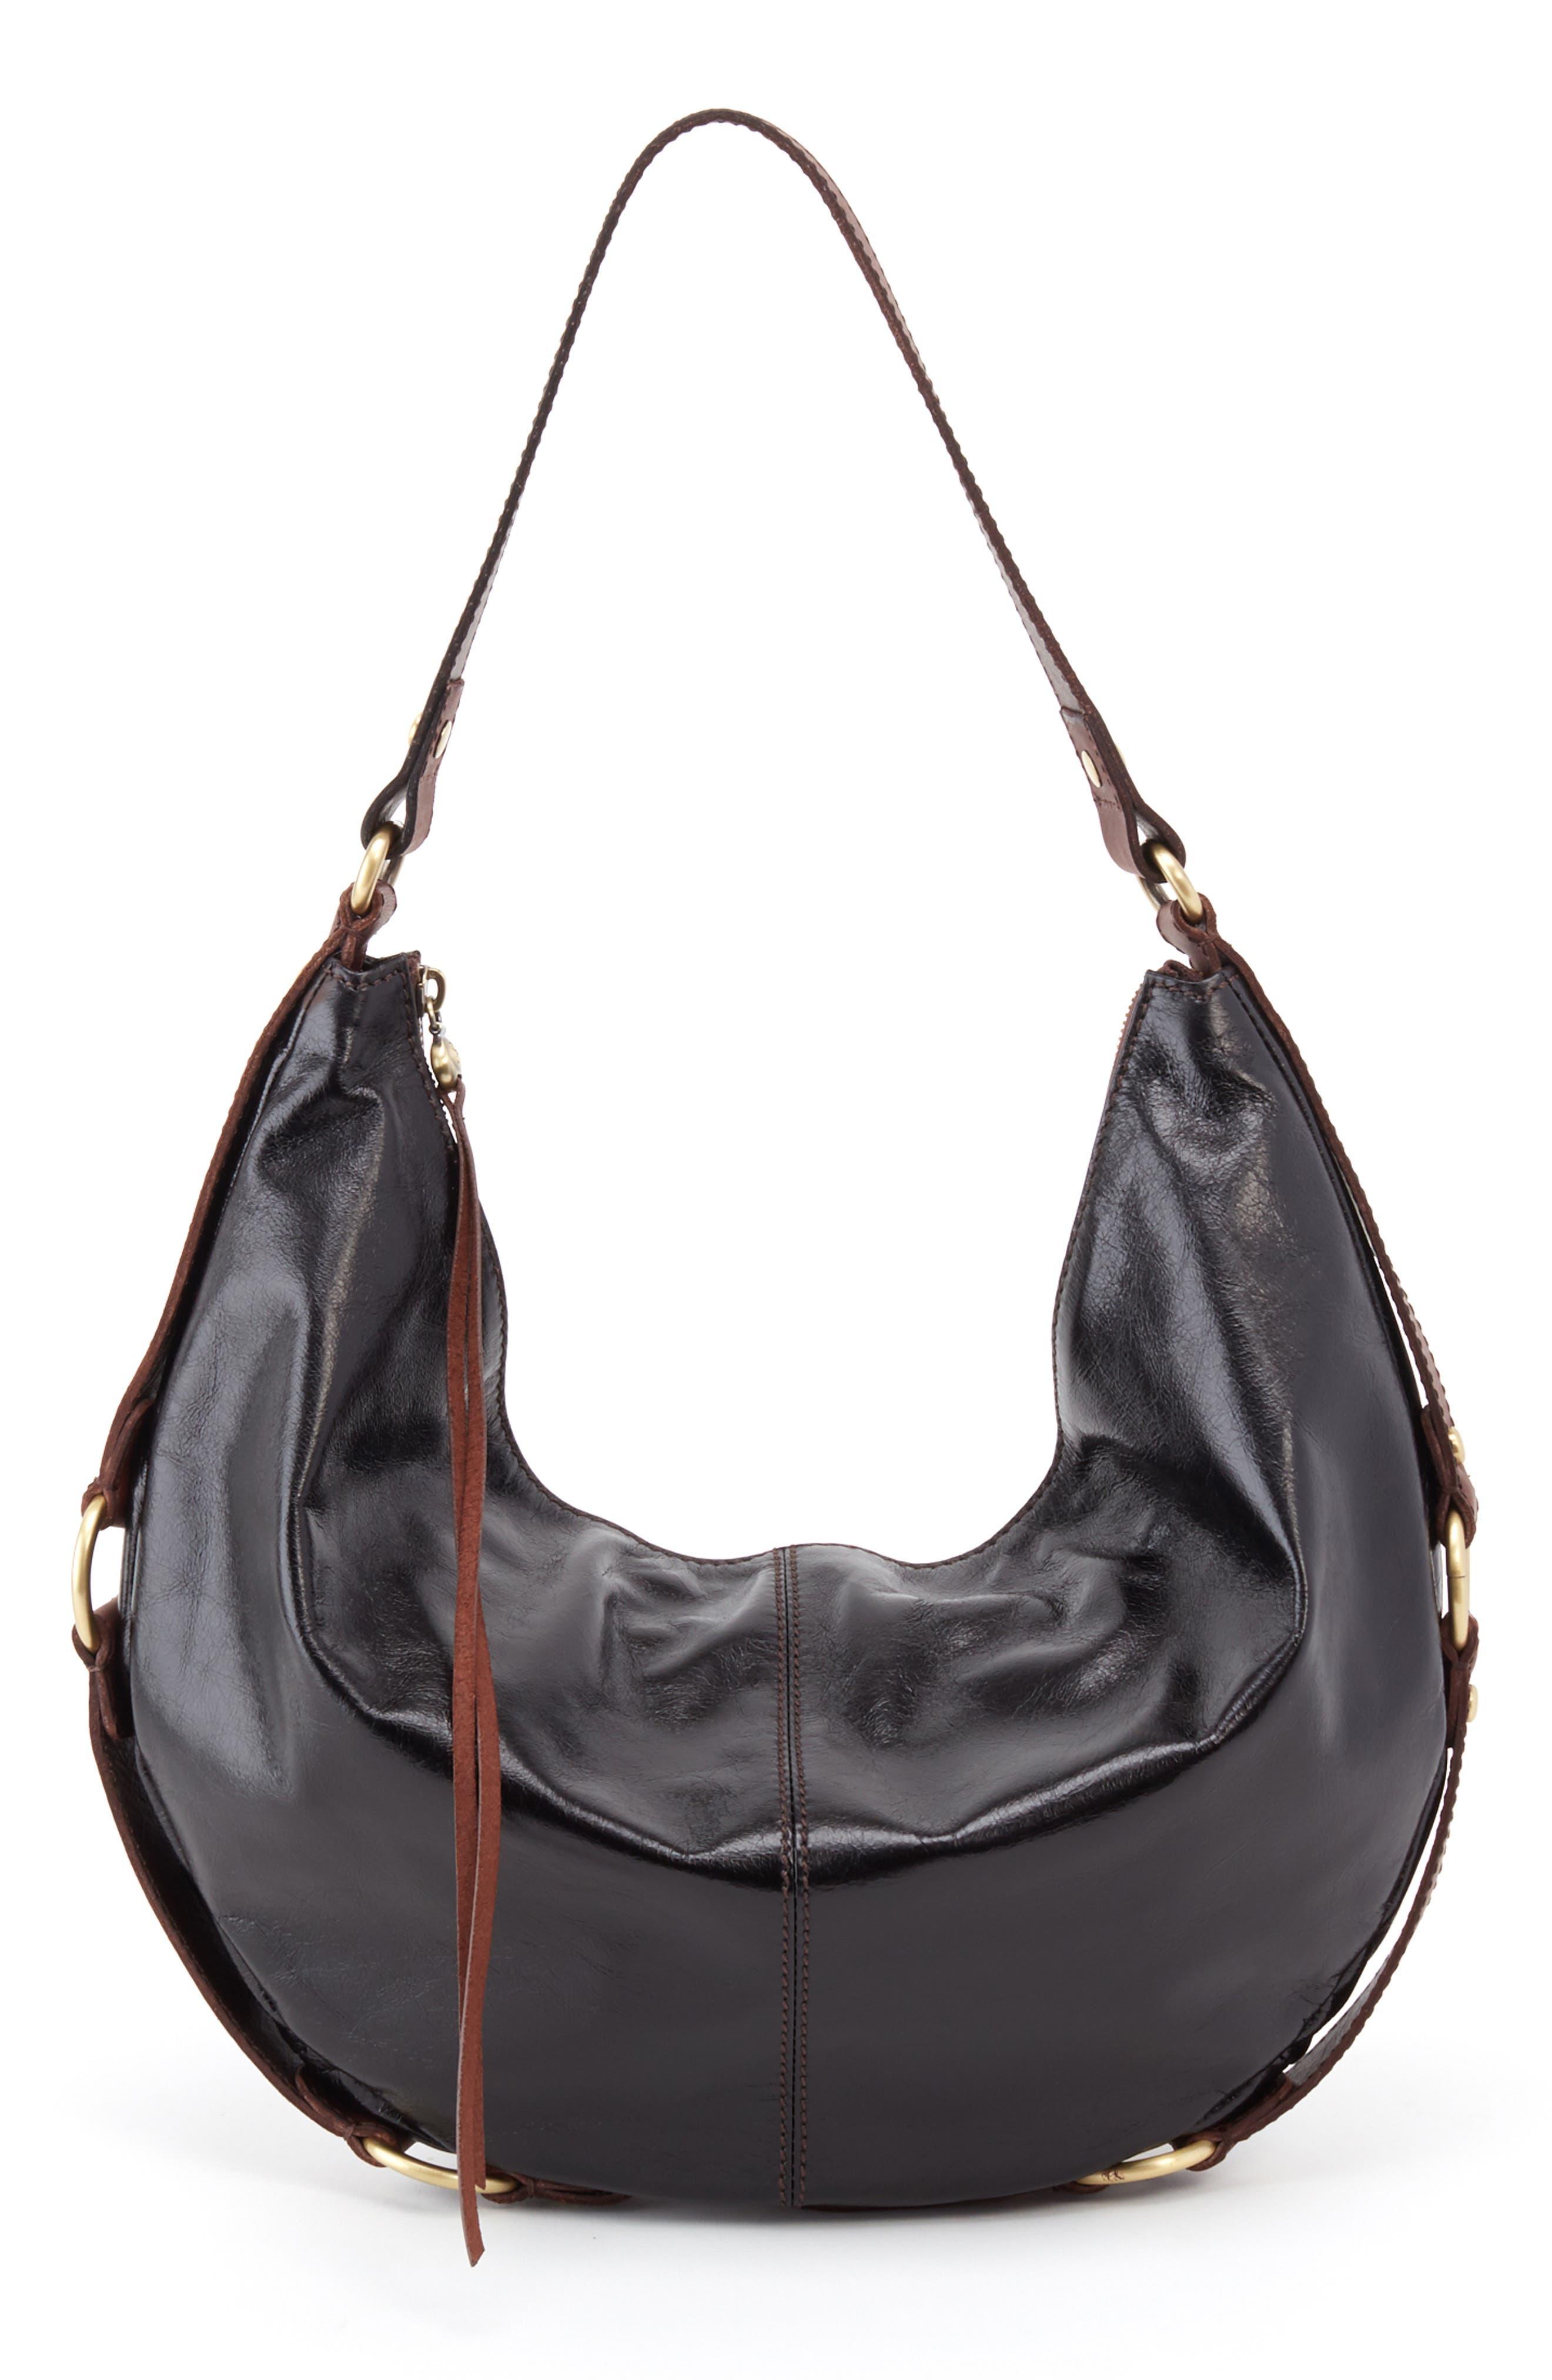 HOBO Rogue Shoulder Bag, Main, color, 001